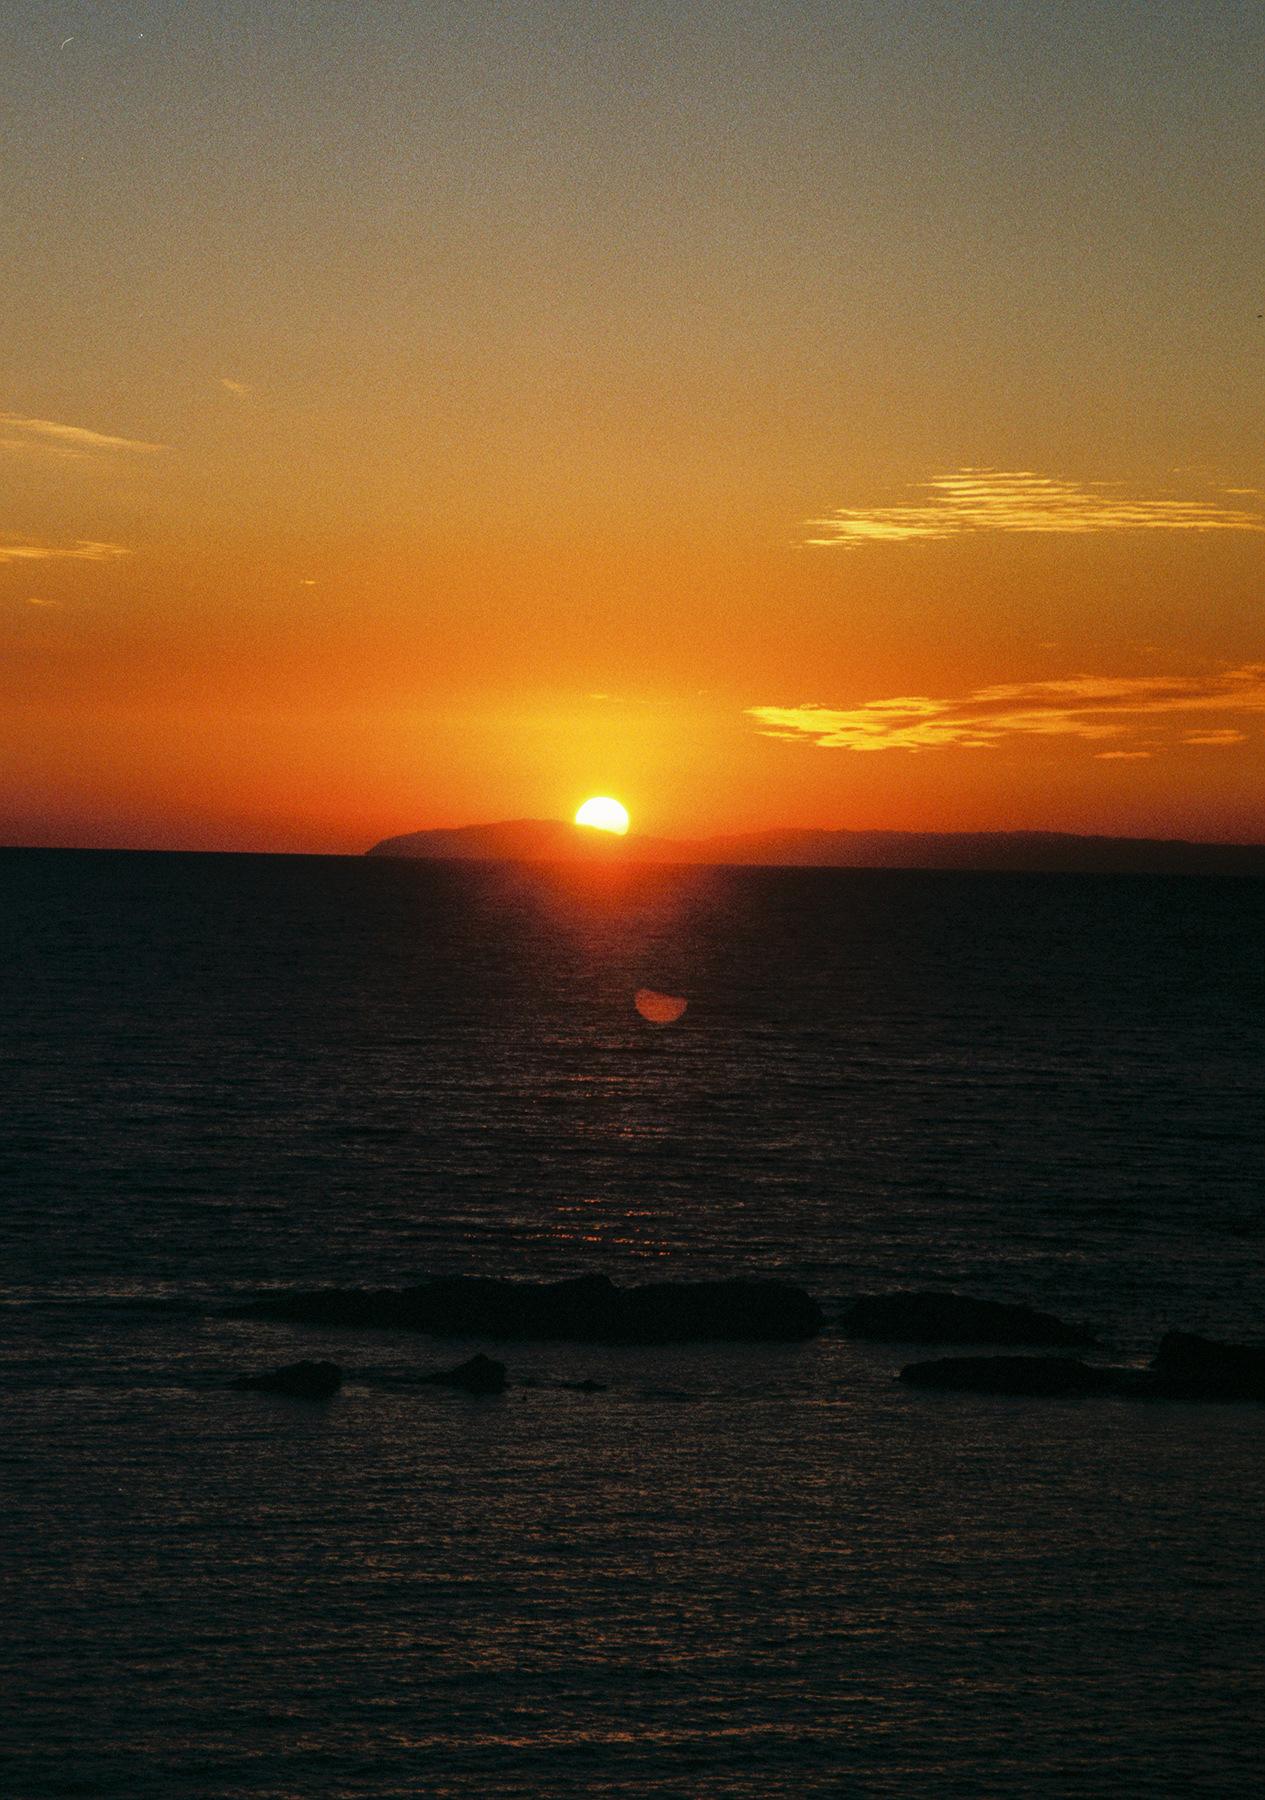 laguna beach wallpaper sunset laguna beach   wwwhigh definition 1265x1800